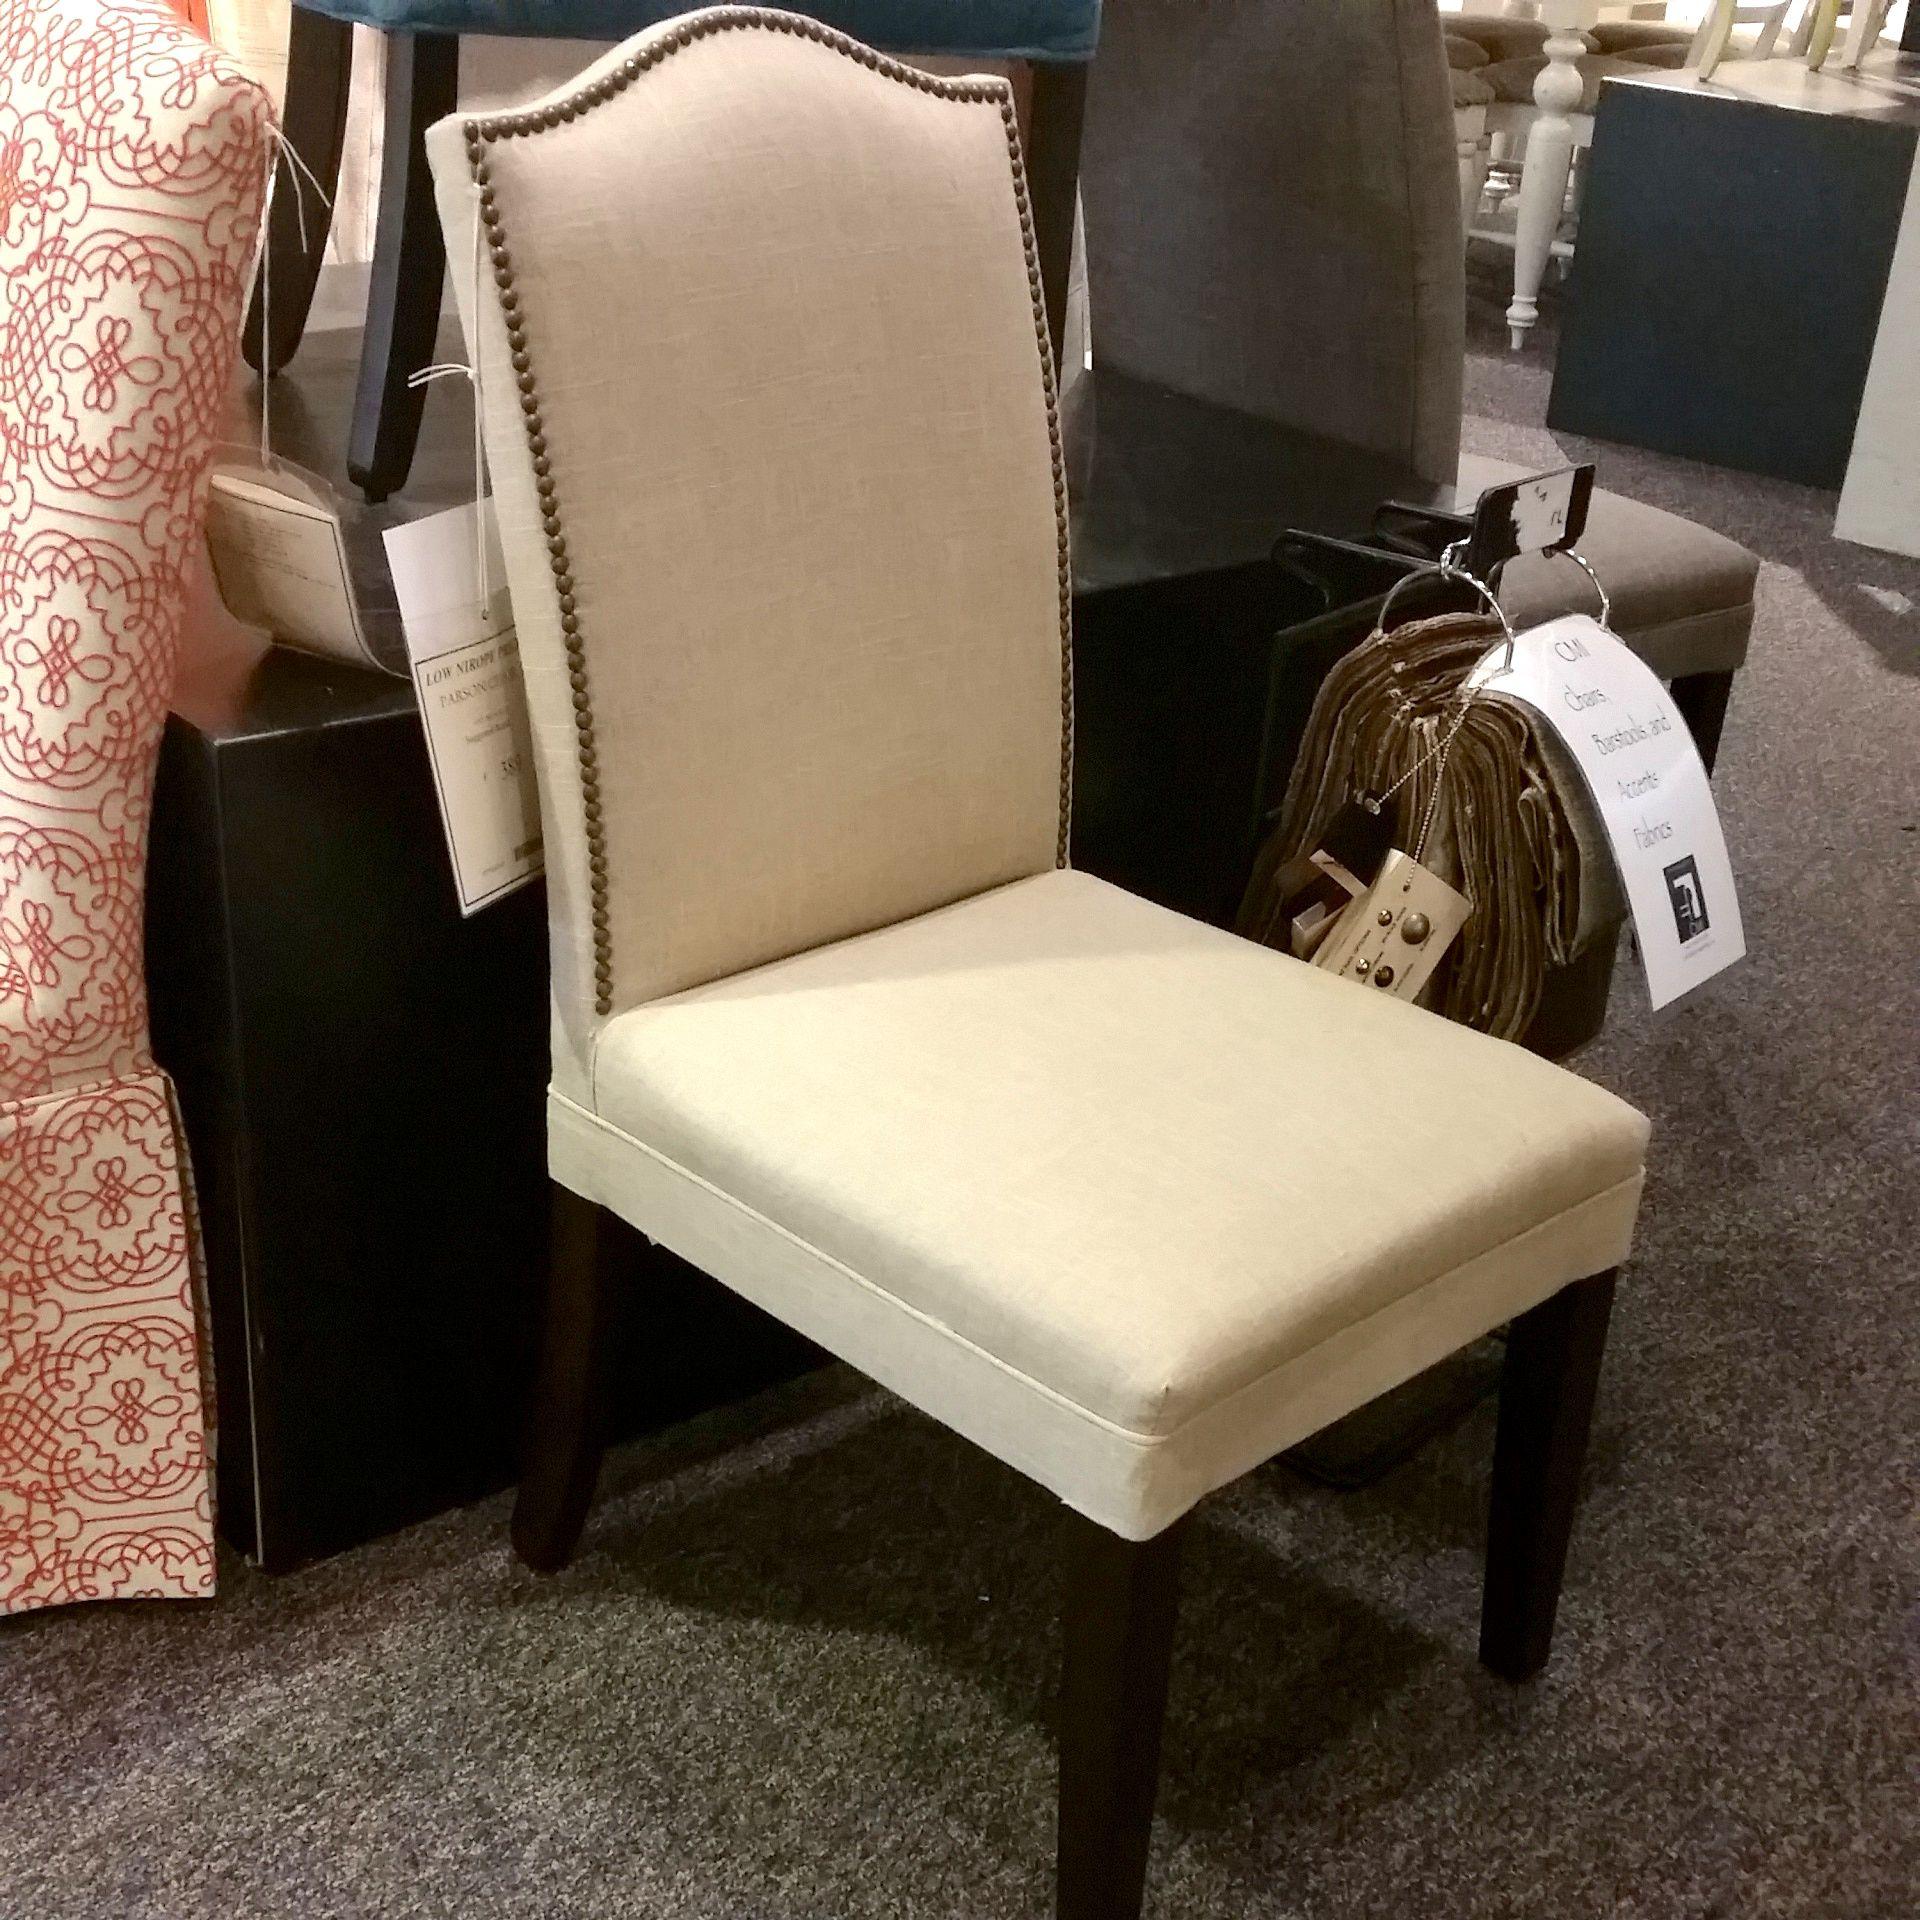 #Cardis #CardisFurniture #Furniture #DiningChair #Chair